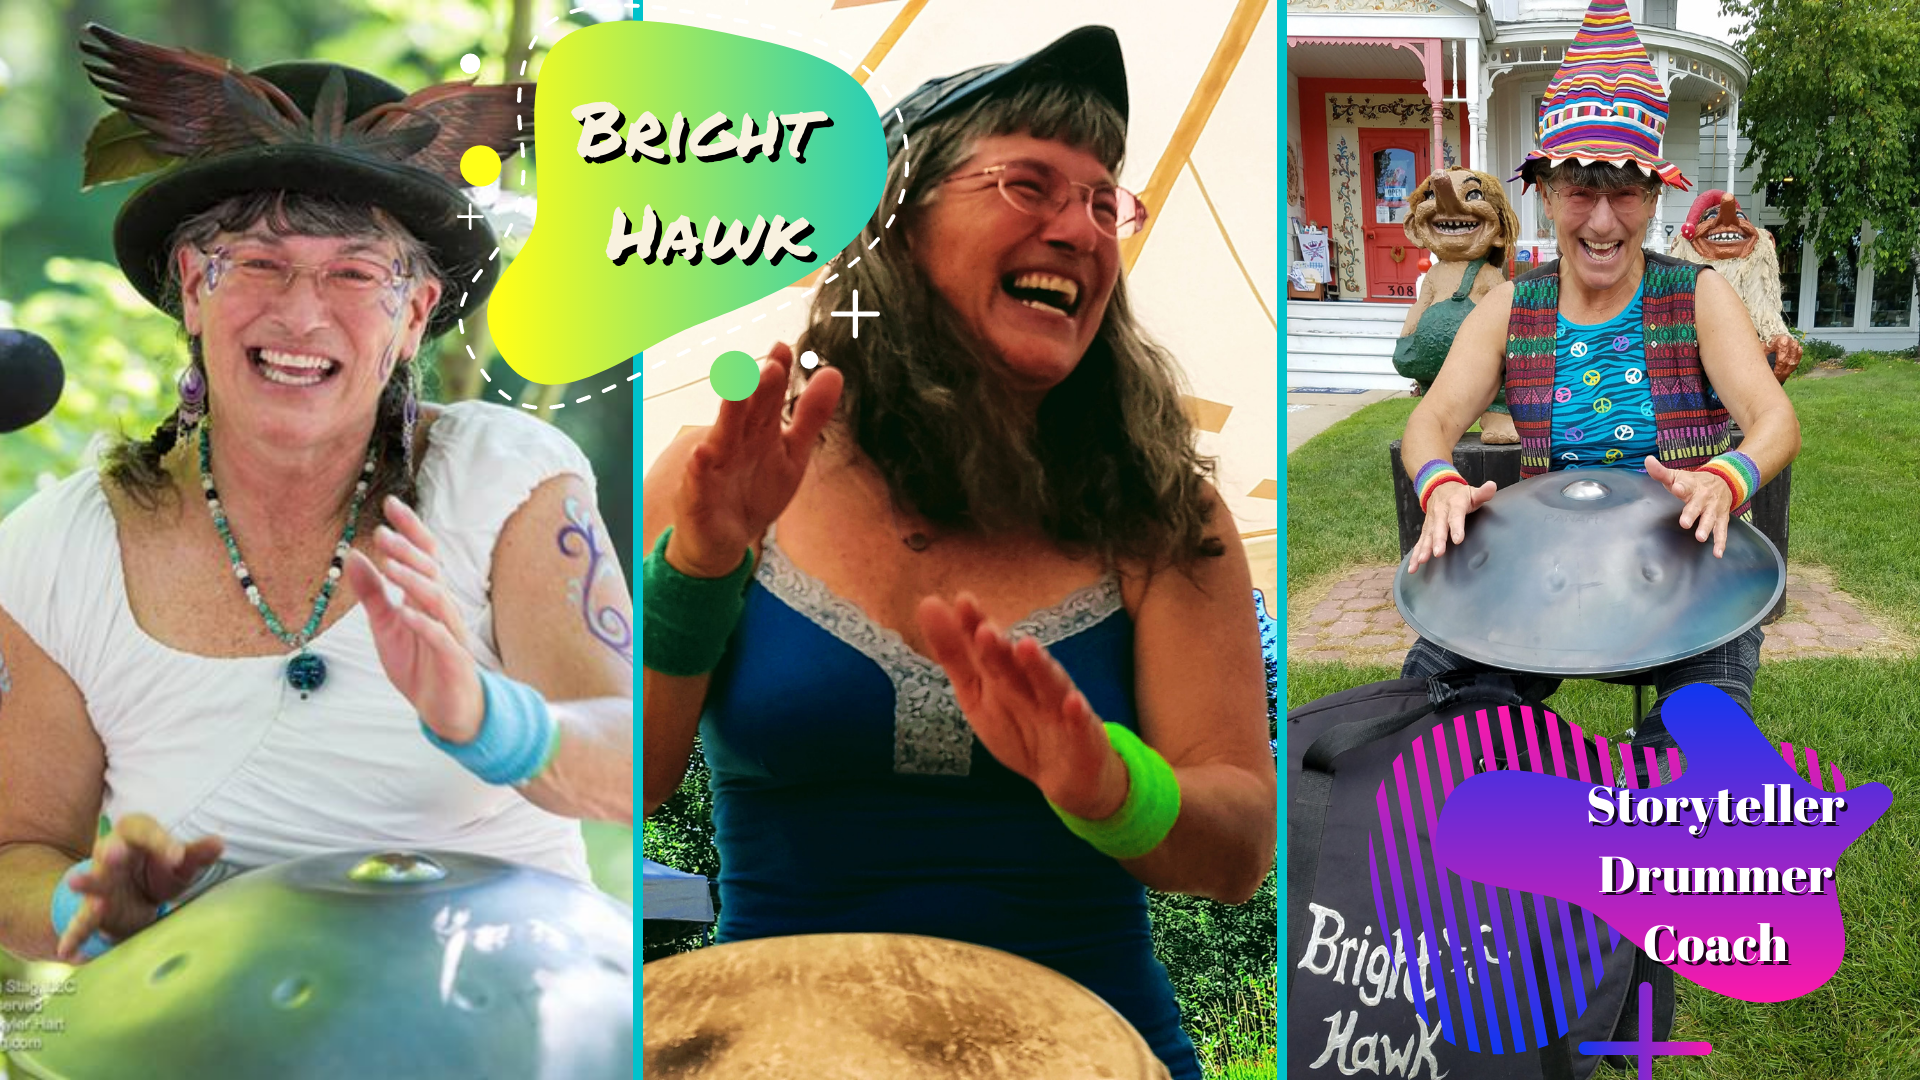 Bright Hawk